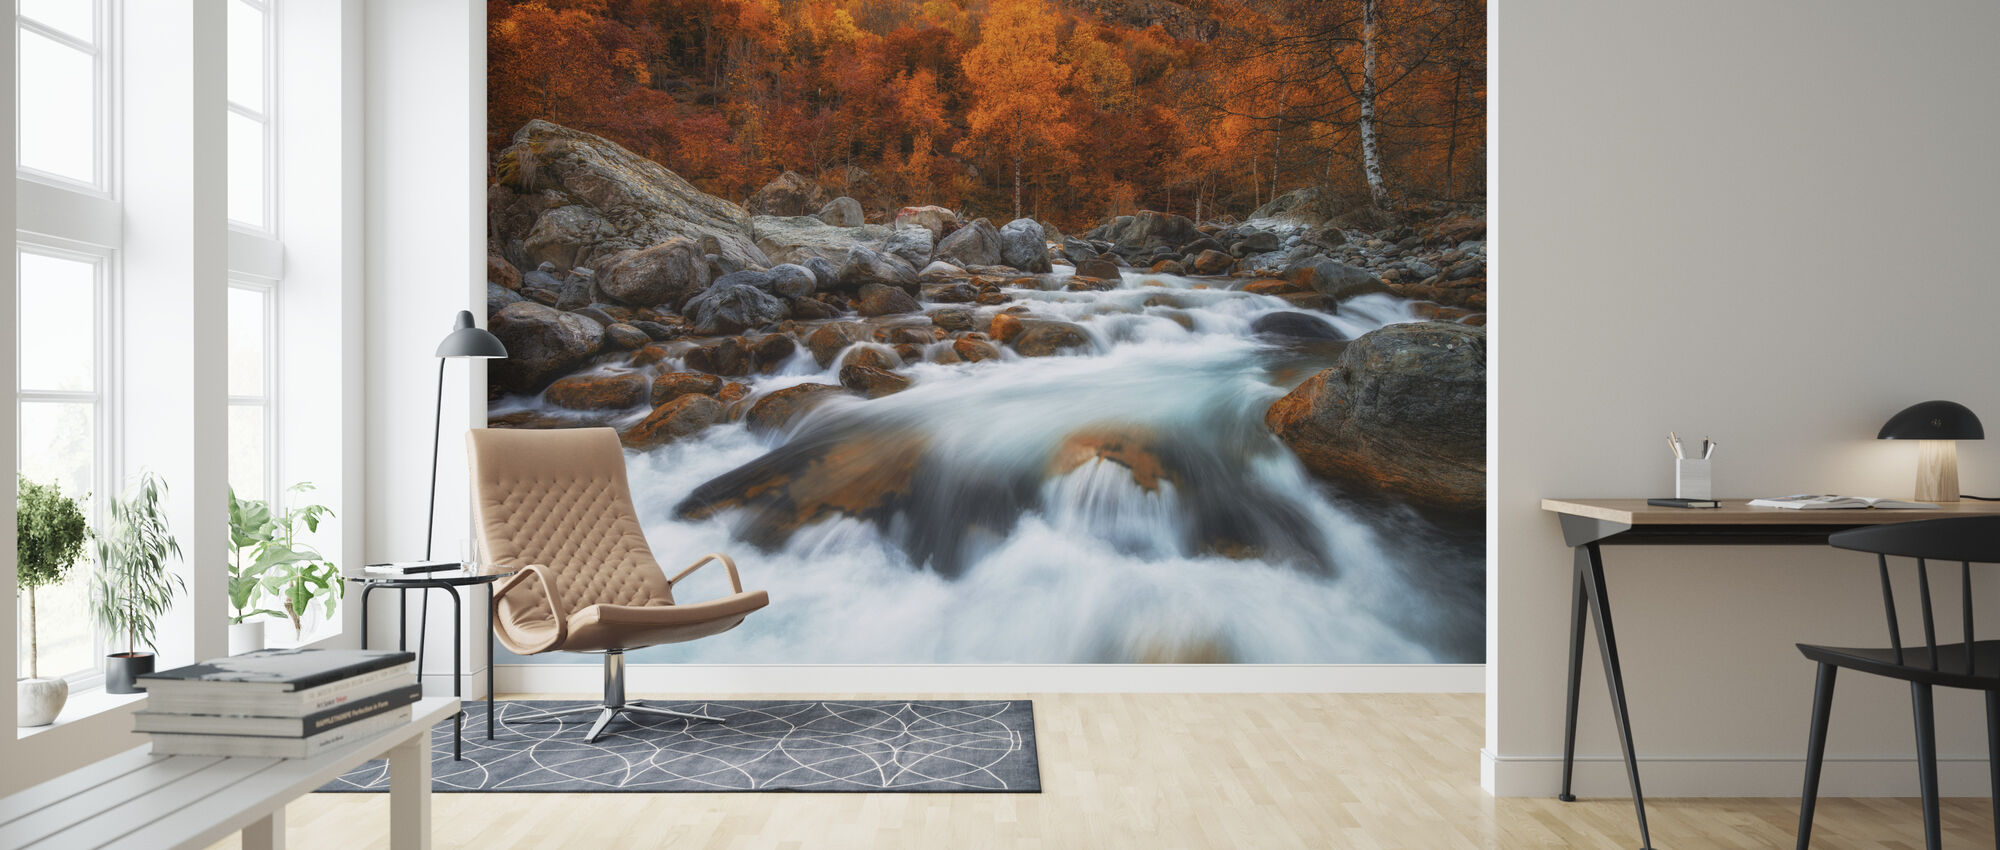 Relax - Wallpaper - Living Room